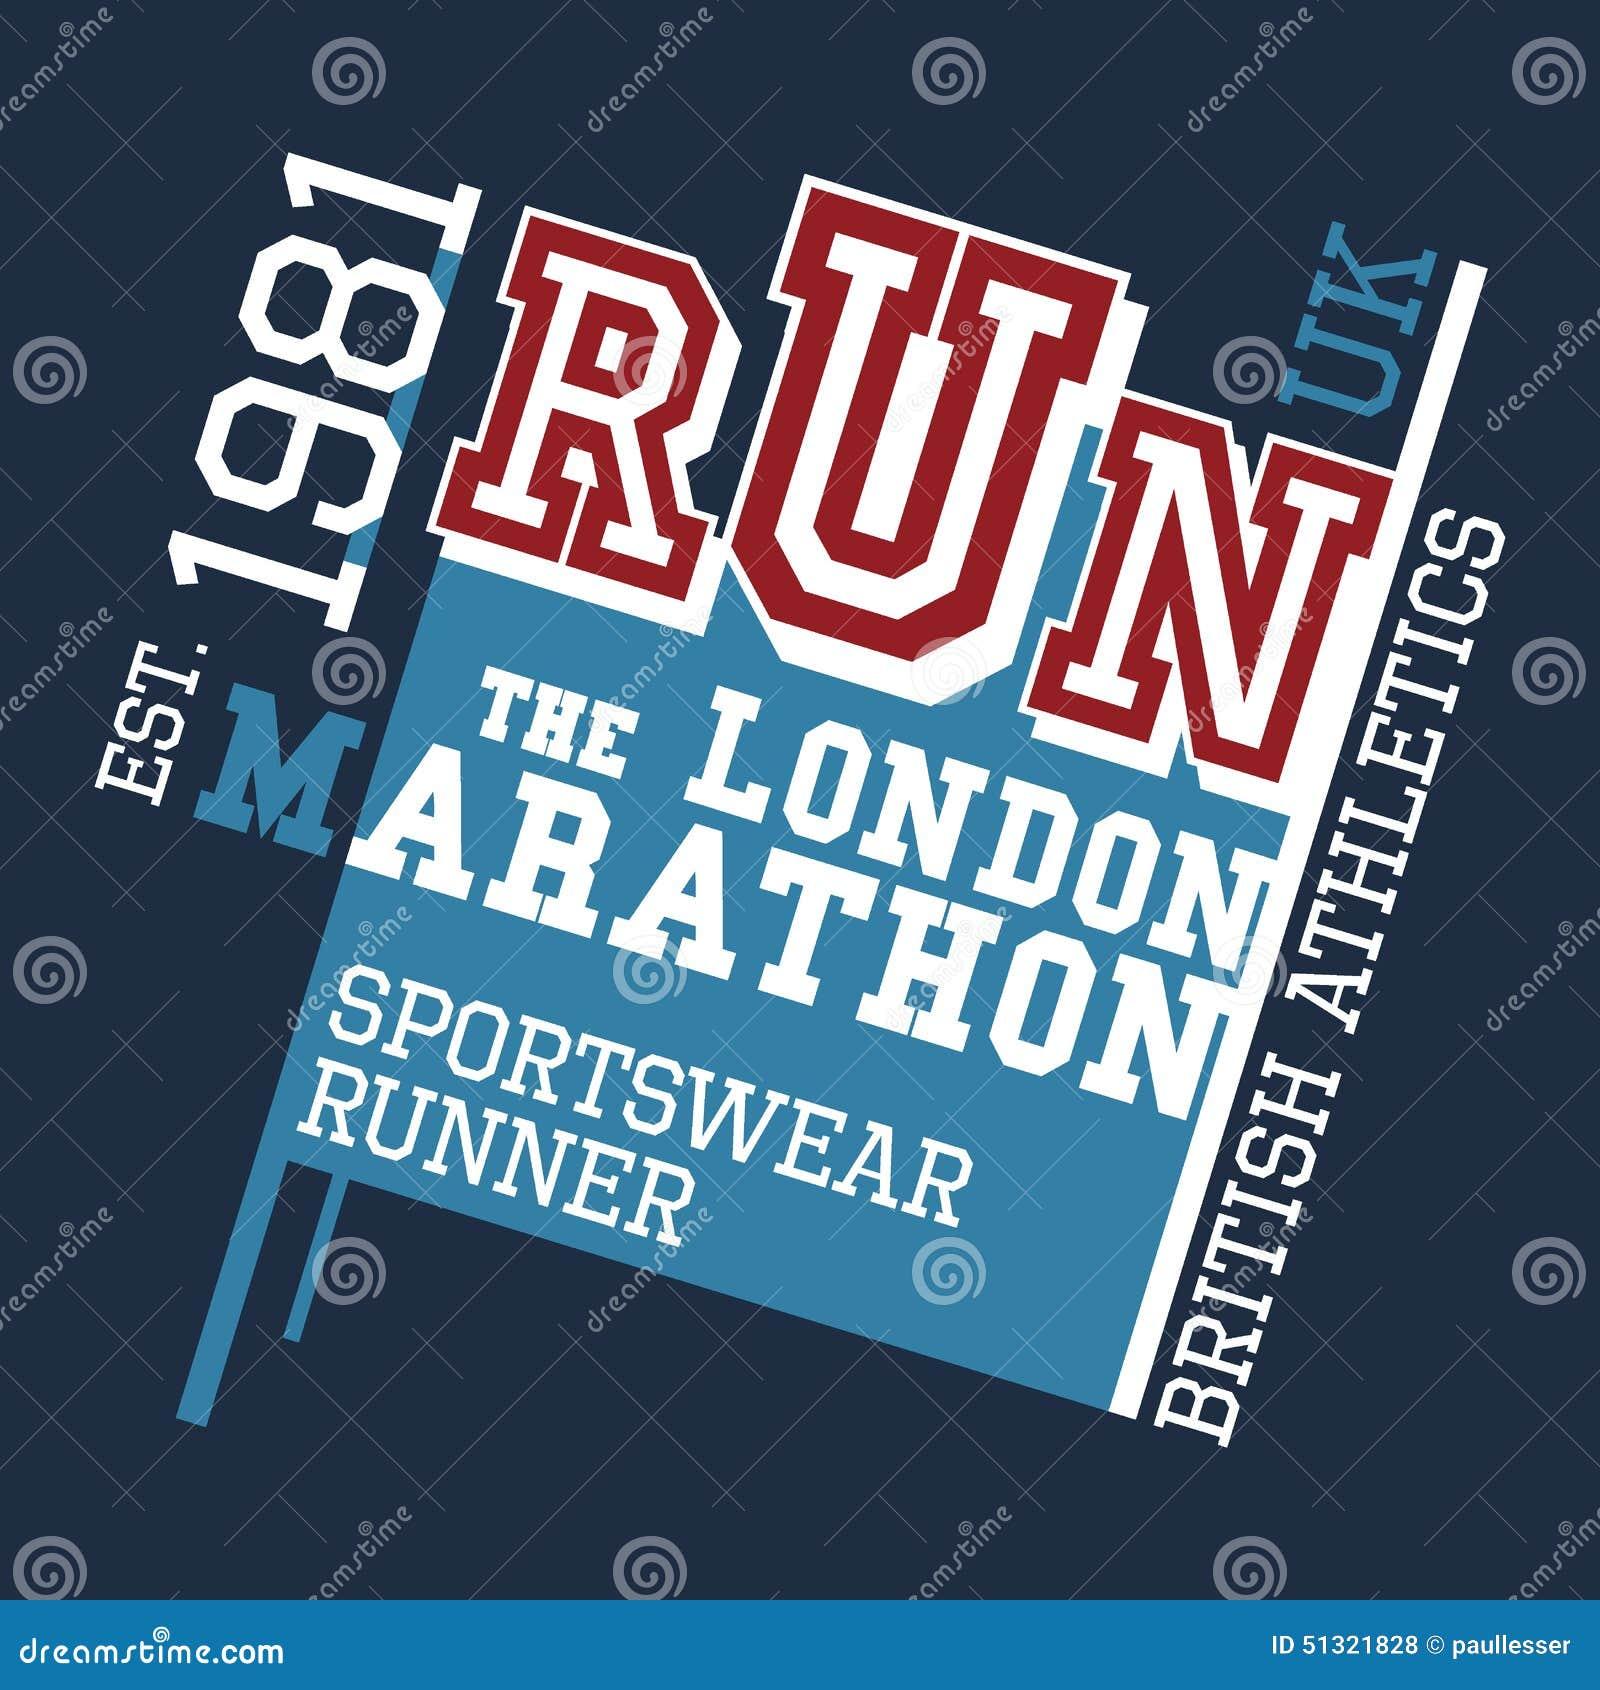 Shirt design london - London Marathon T Shirt Design Royalty Free Stock Photos